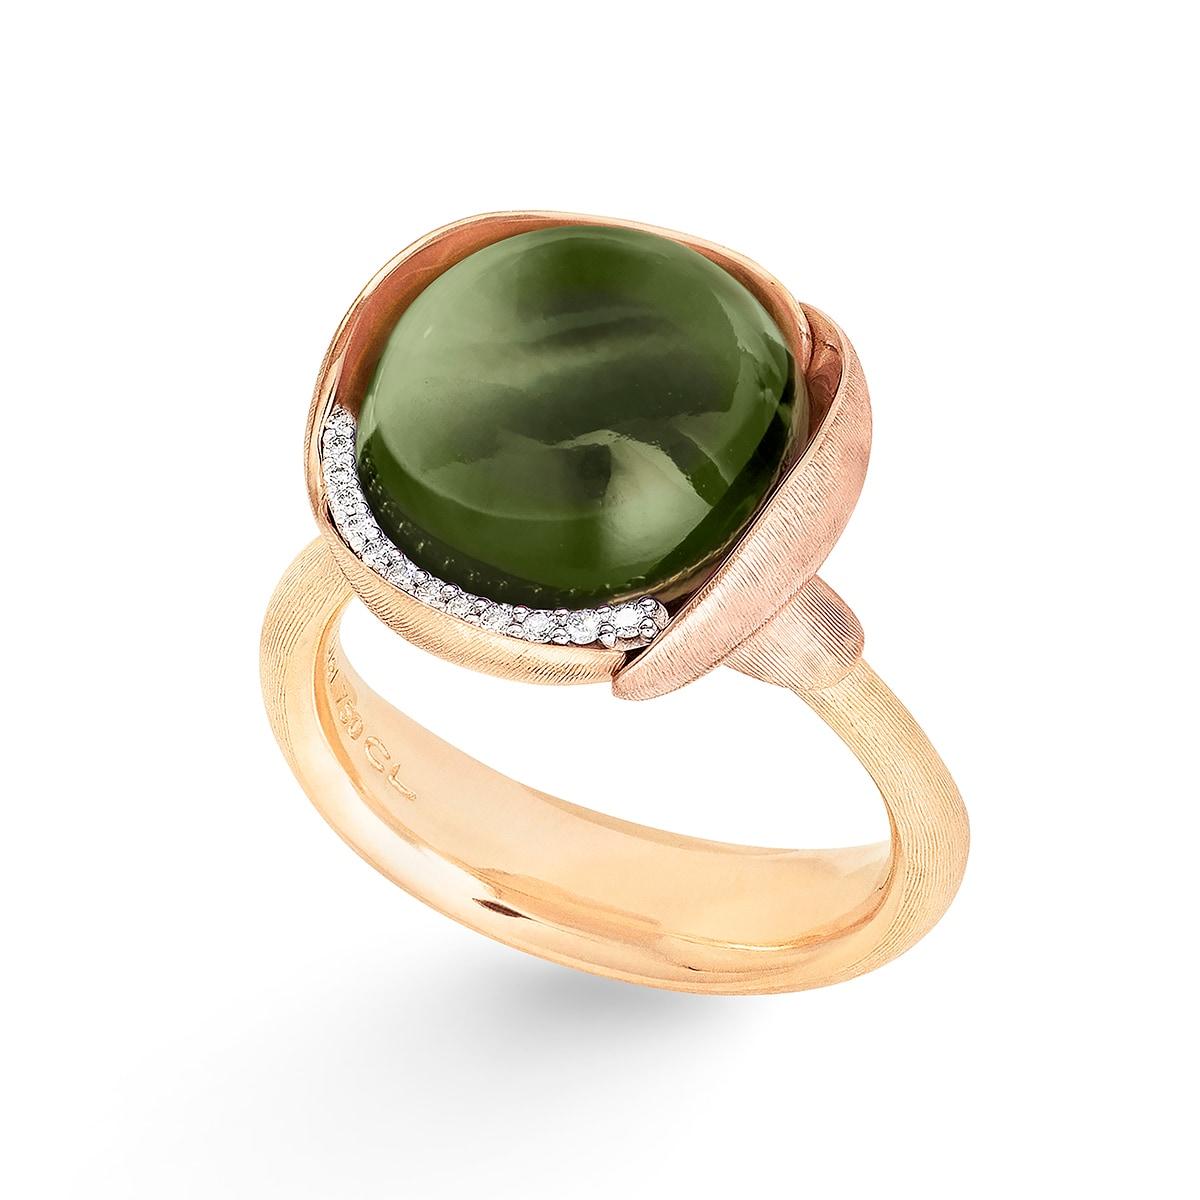 Ole_Lynggaard_Lotus_Ring 3_Green Tourmaline_A2652-412_V3_hos_Jarl_Sandin